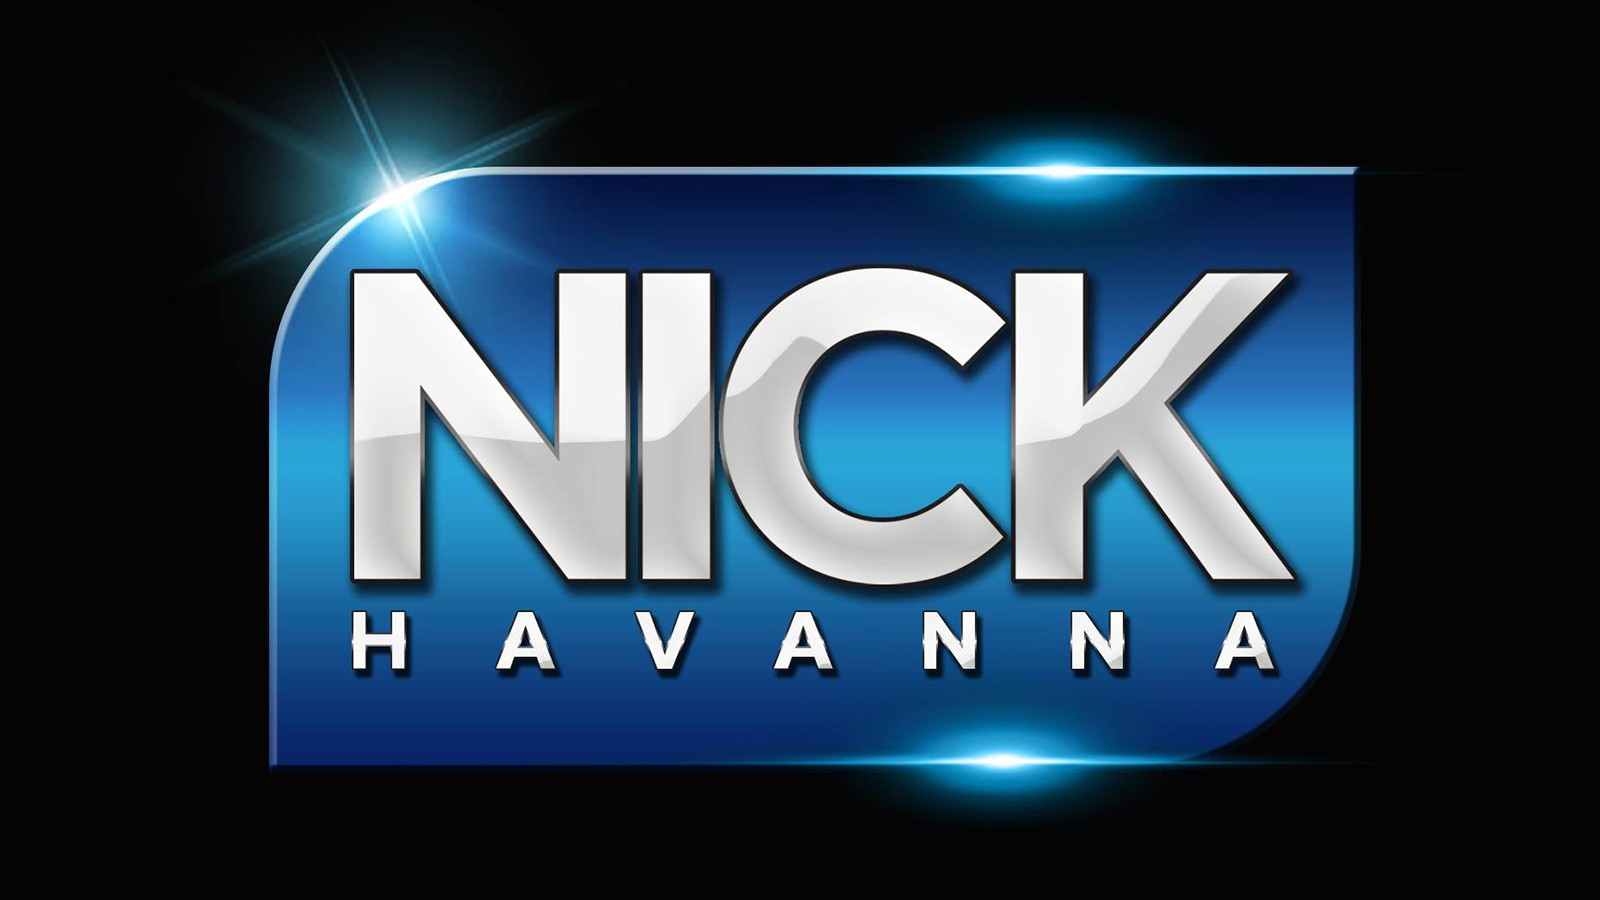 Logo de Discoteca Nick Havanna